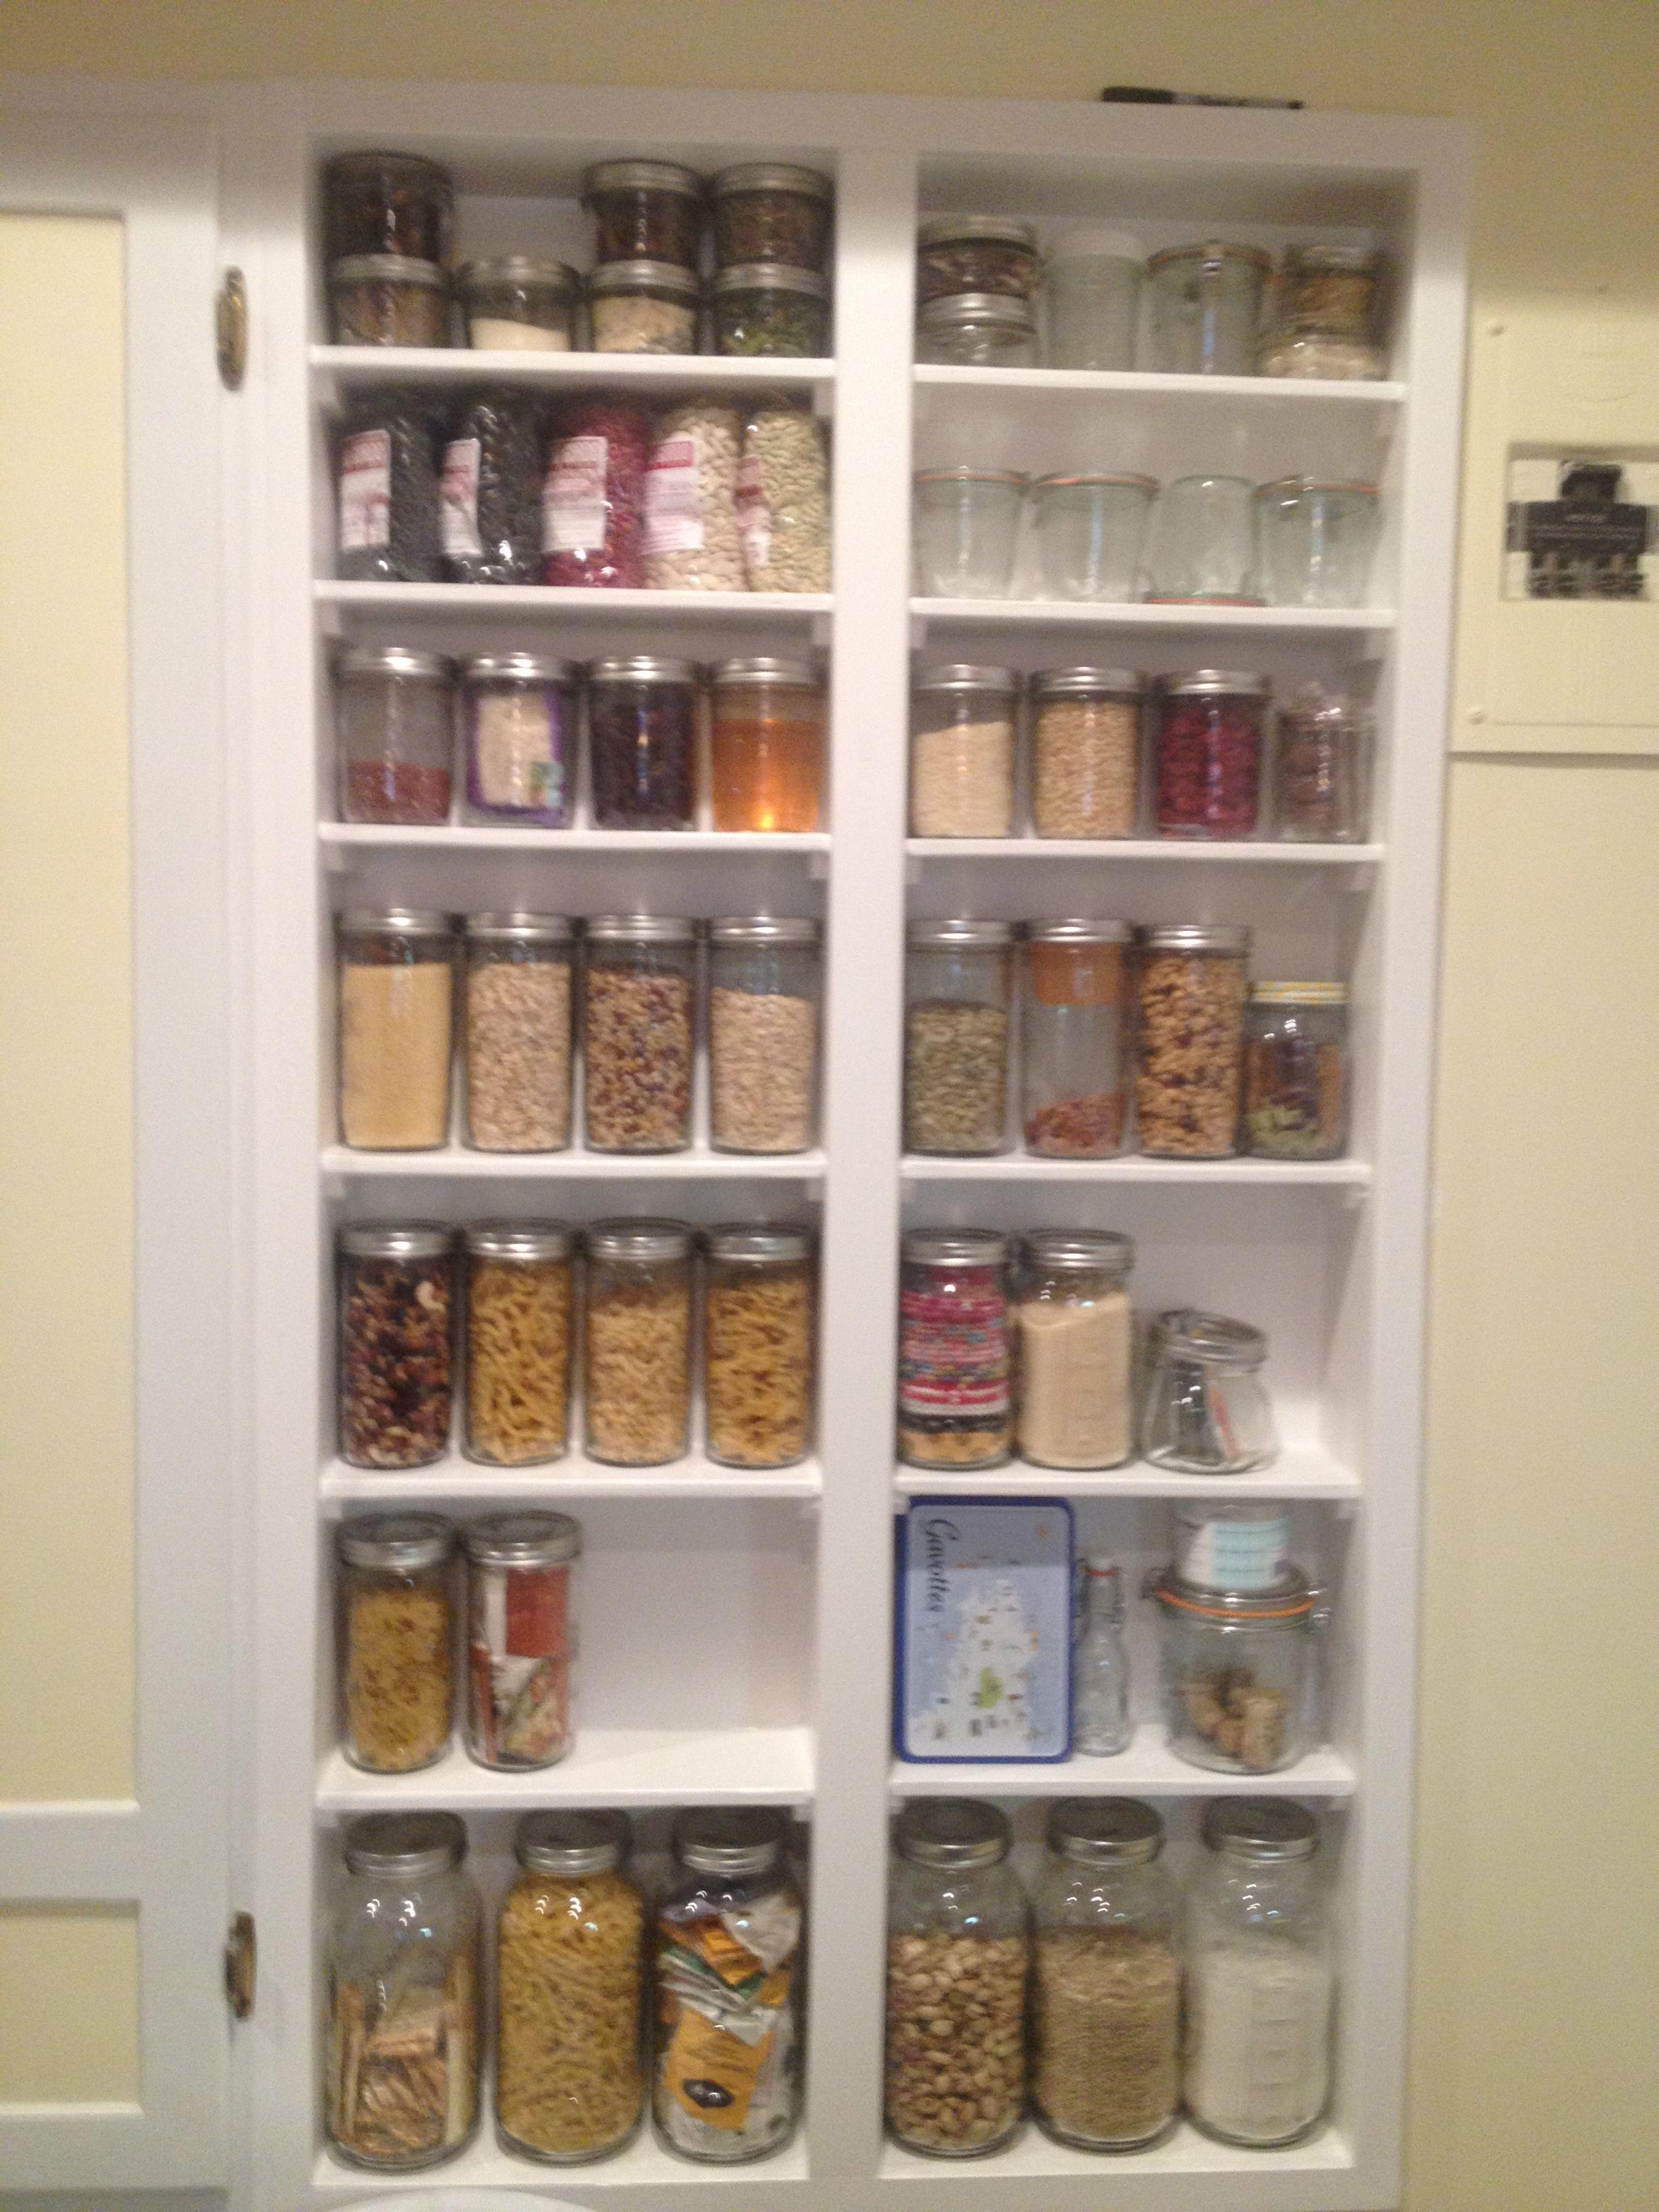 New Kitchen Shelf For Mason Jar Storage Food Storage Cabinet Kitchen Cabinet Storage Kitchen Storage Shelves